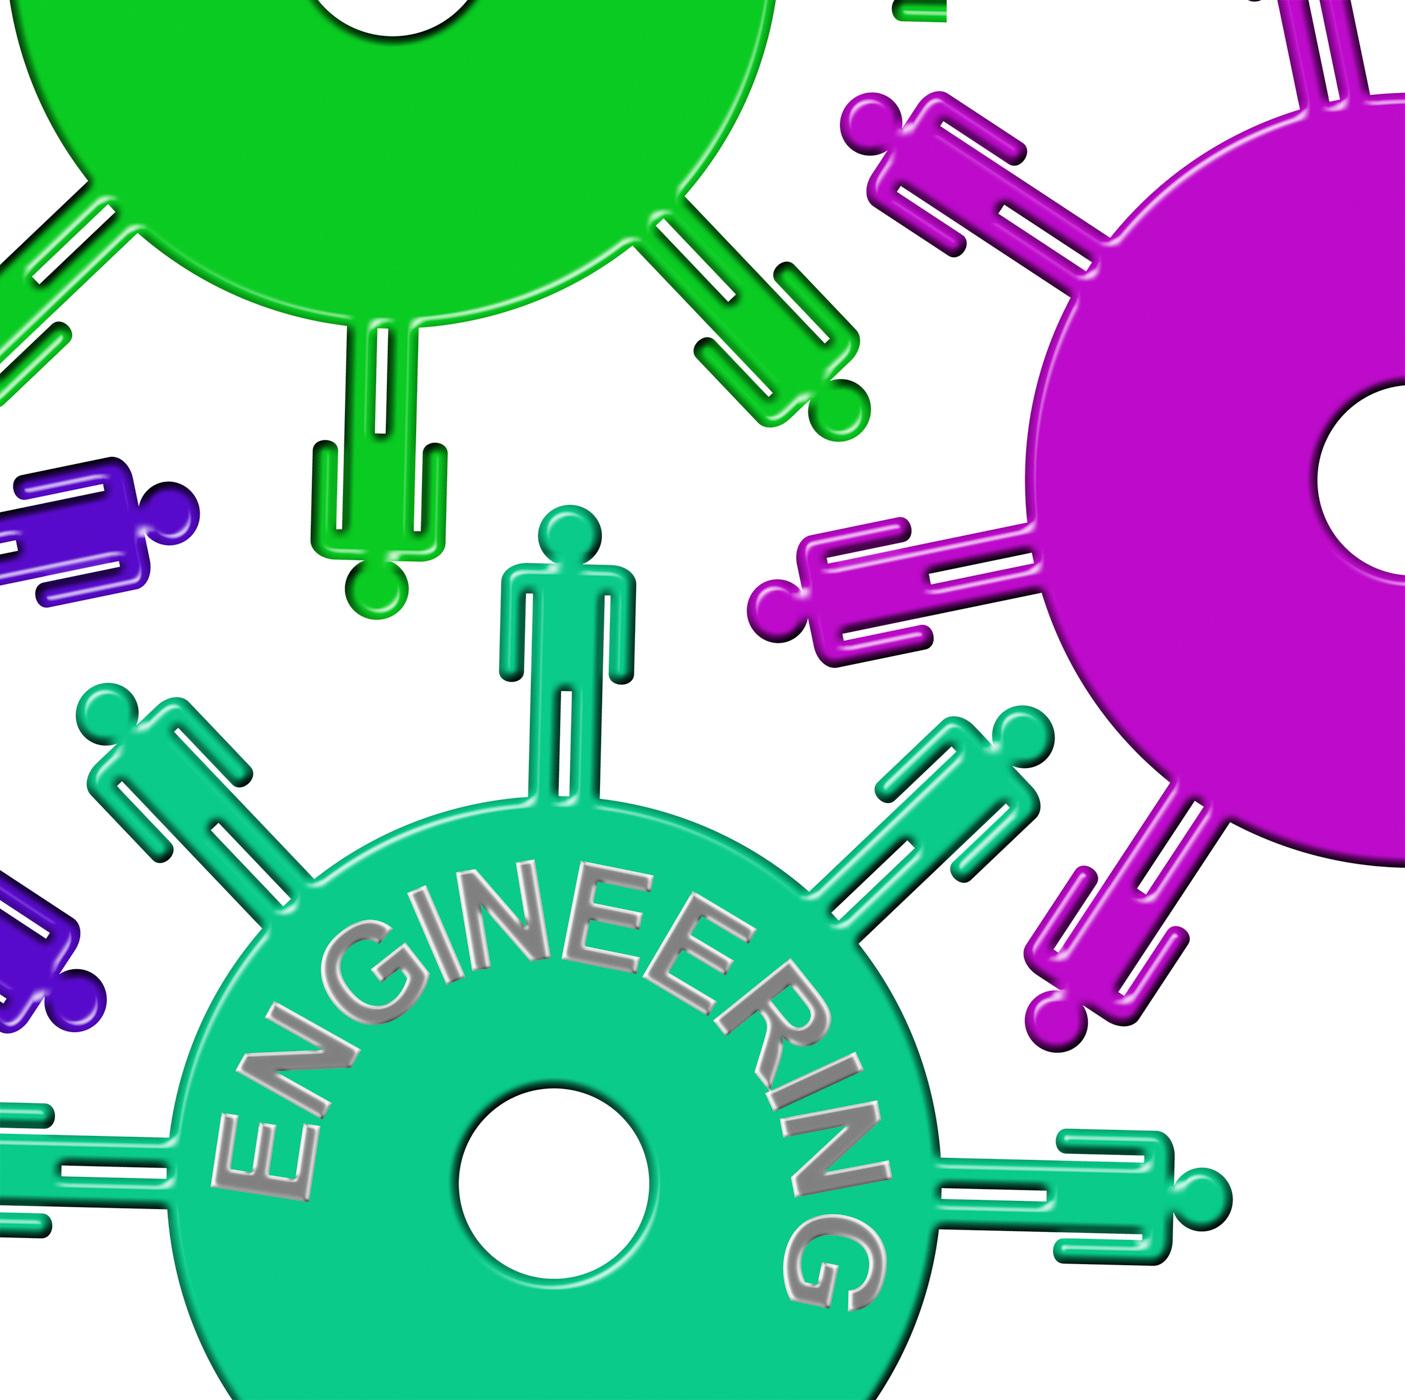 Engineering Cogs Represents Gear Wheel And Clockwork, Clockwork, Gears, Team, Mechanics, HQ Photo